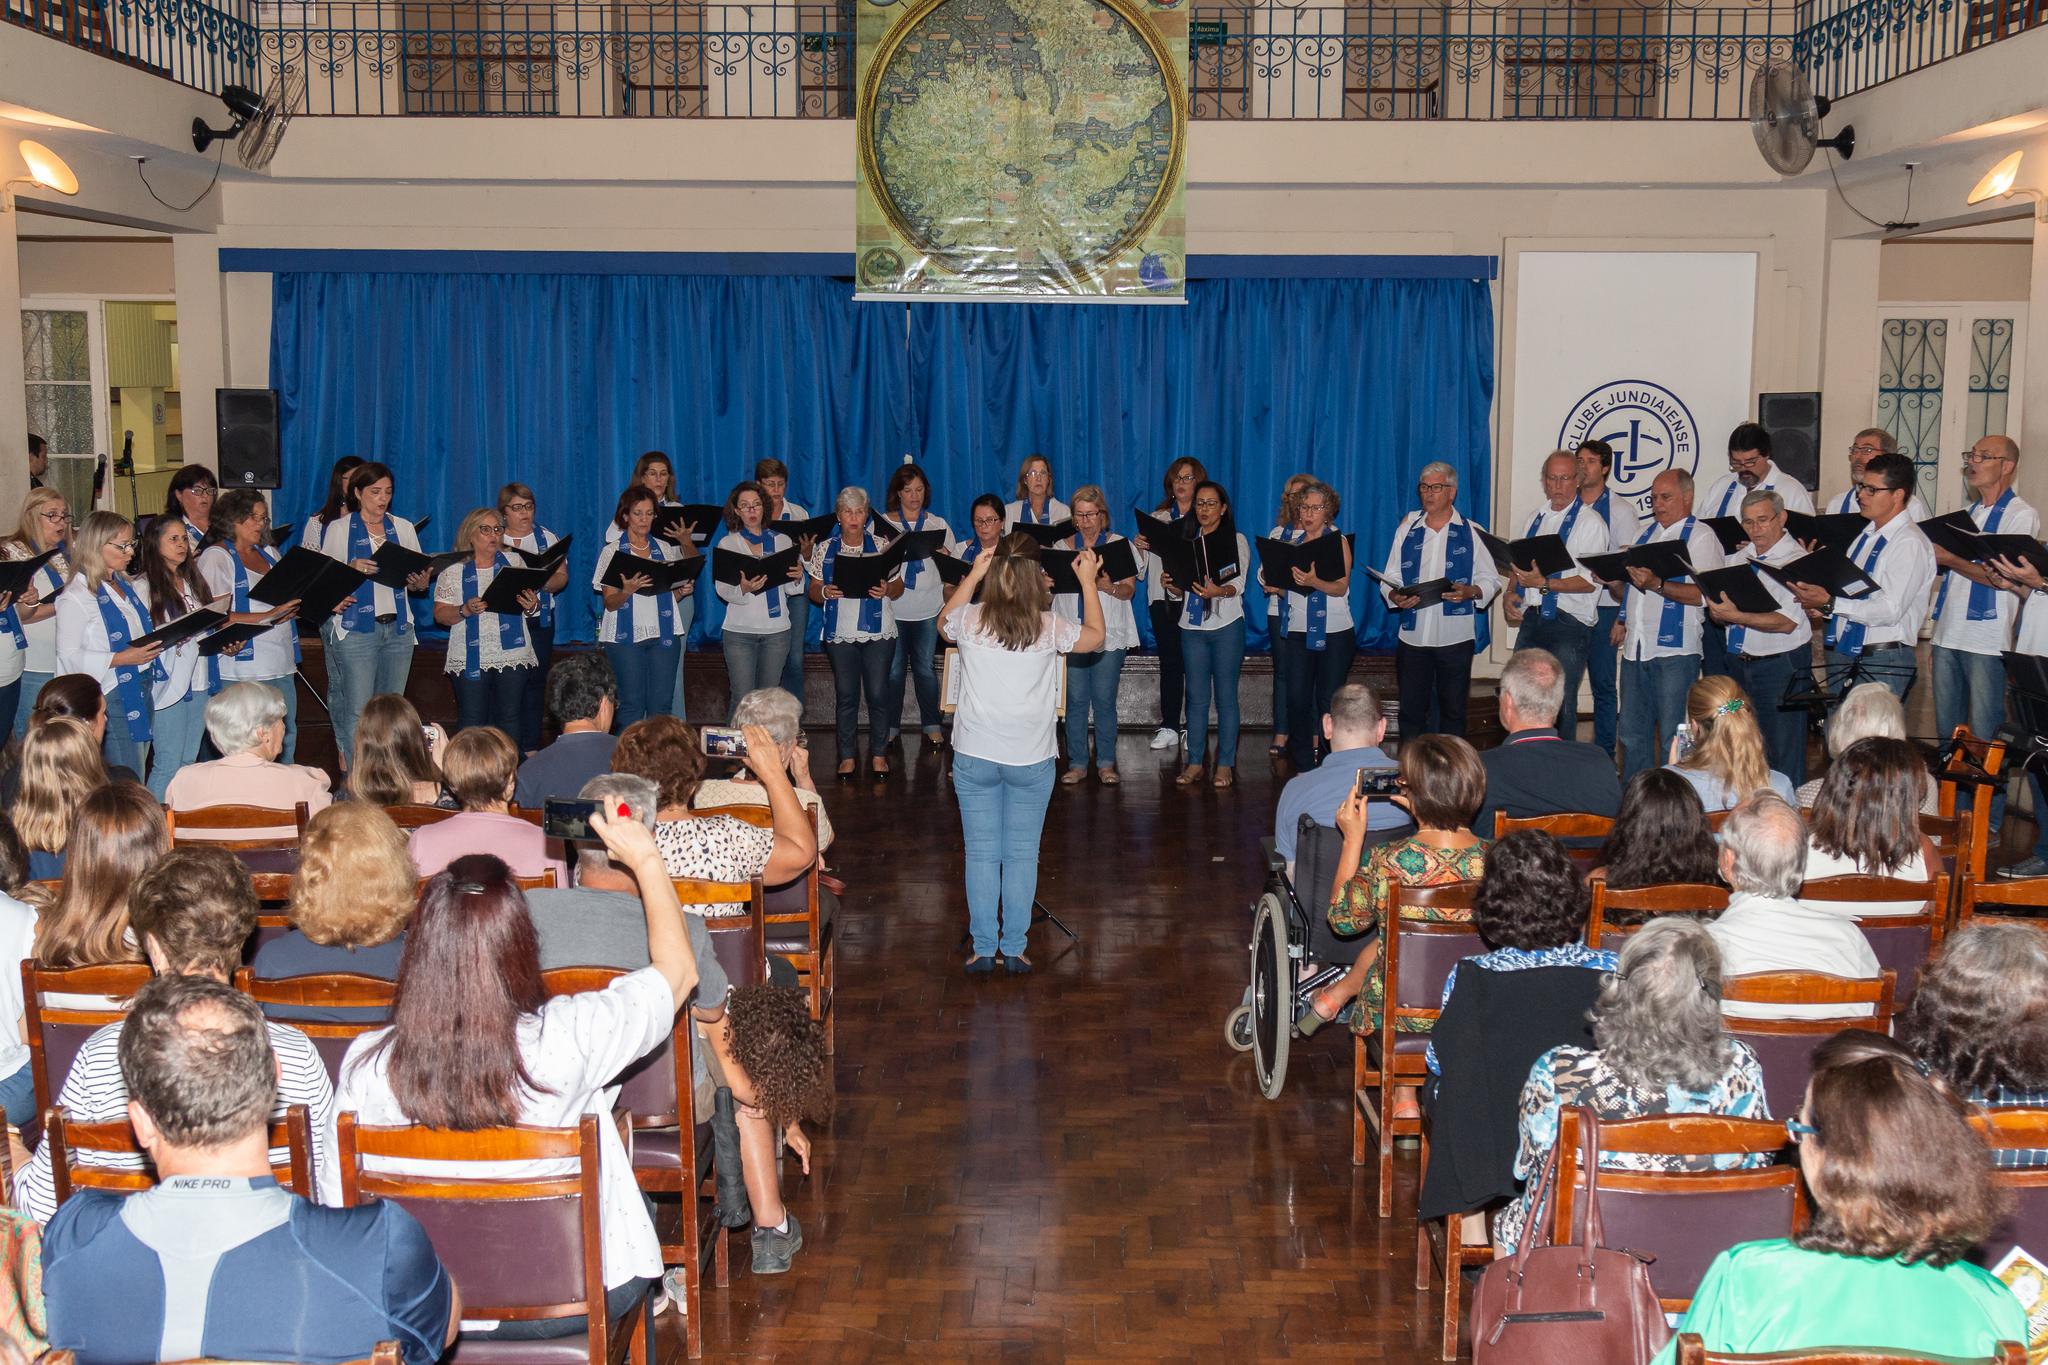 Concerto Vozes do Mundo - Sede Central (25/11/2018)